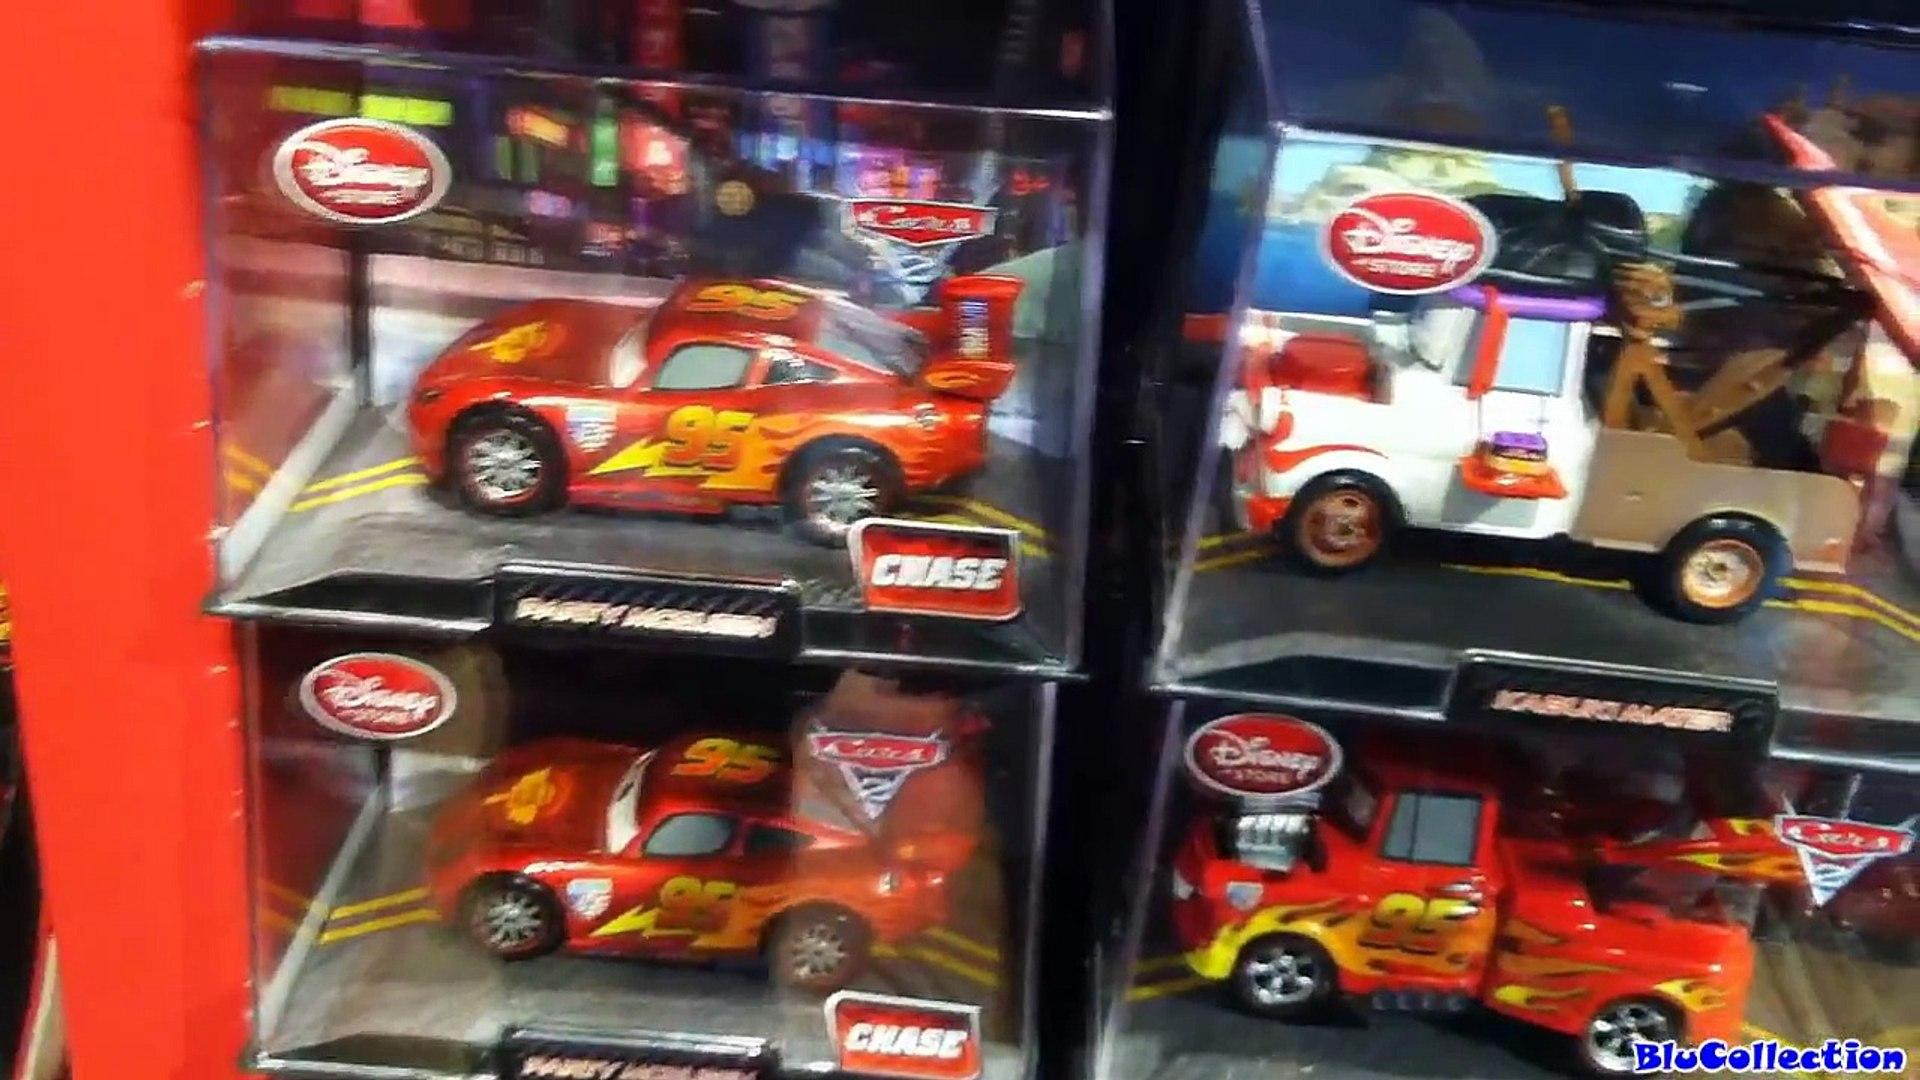 Cars 2 Kabuki Mater Chase Stealth Finn Mcmissile, Metallic Party Lightning Mcqueen Disney Pixar toys